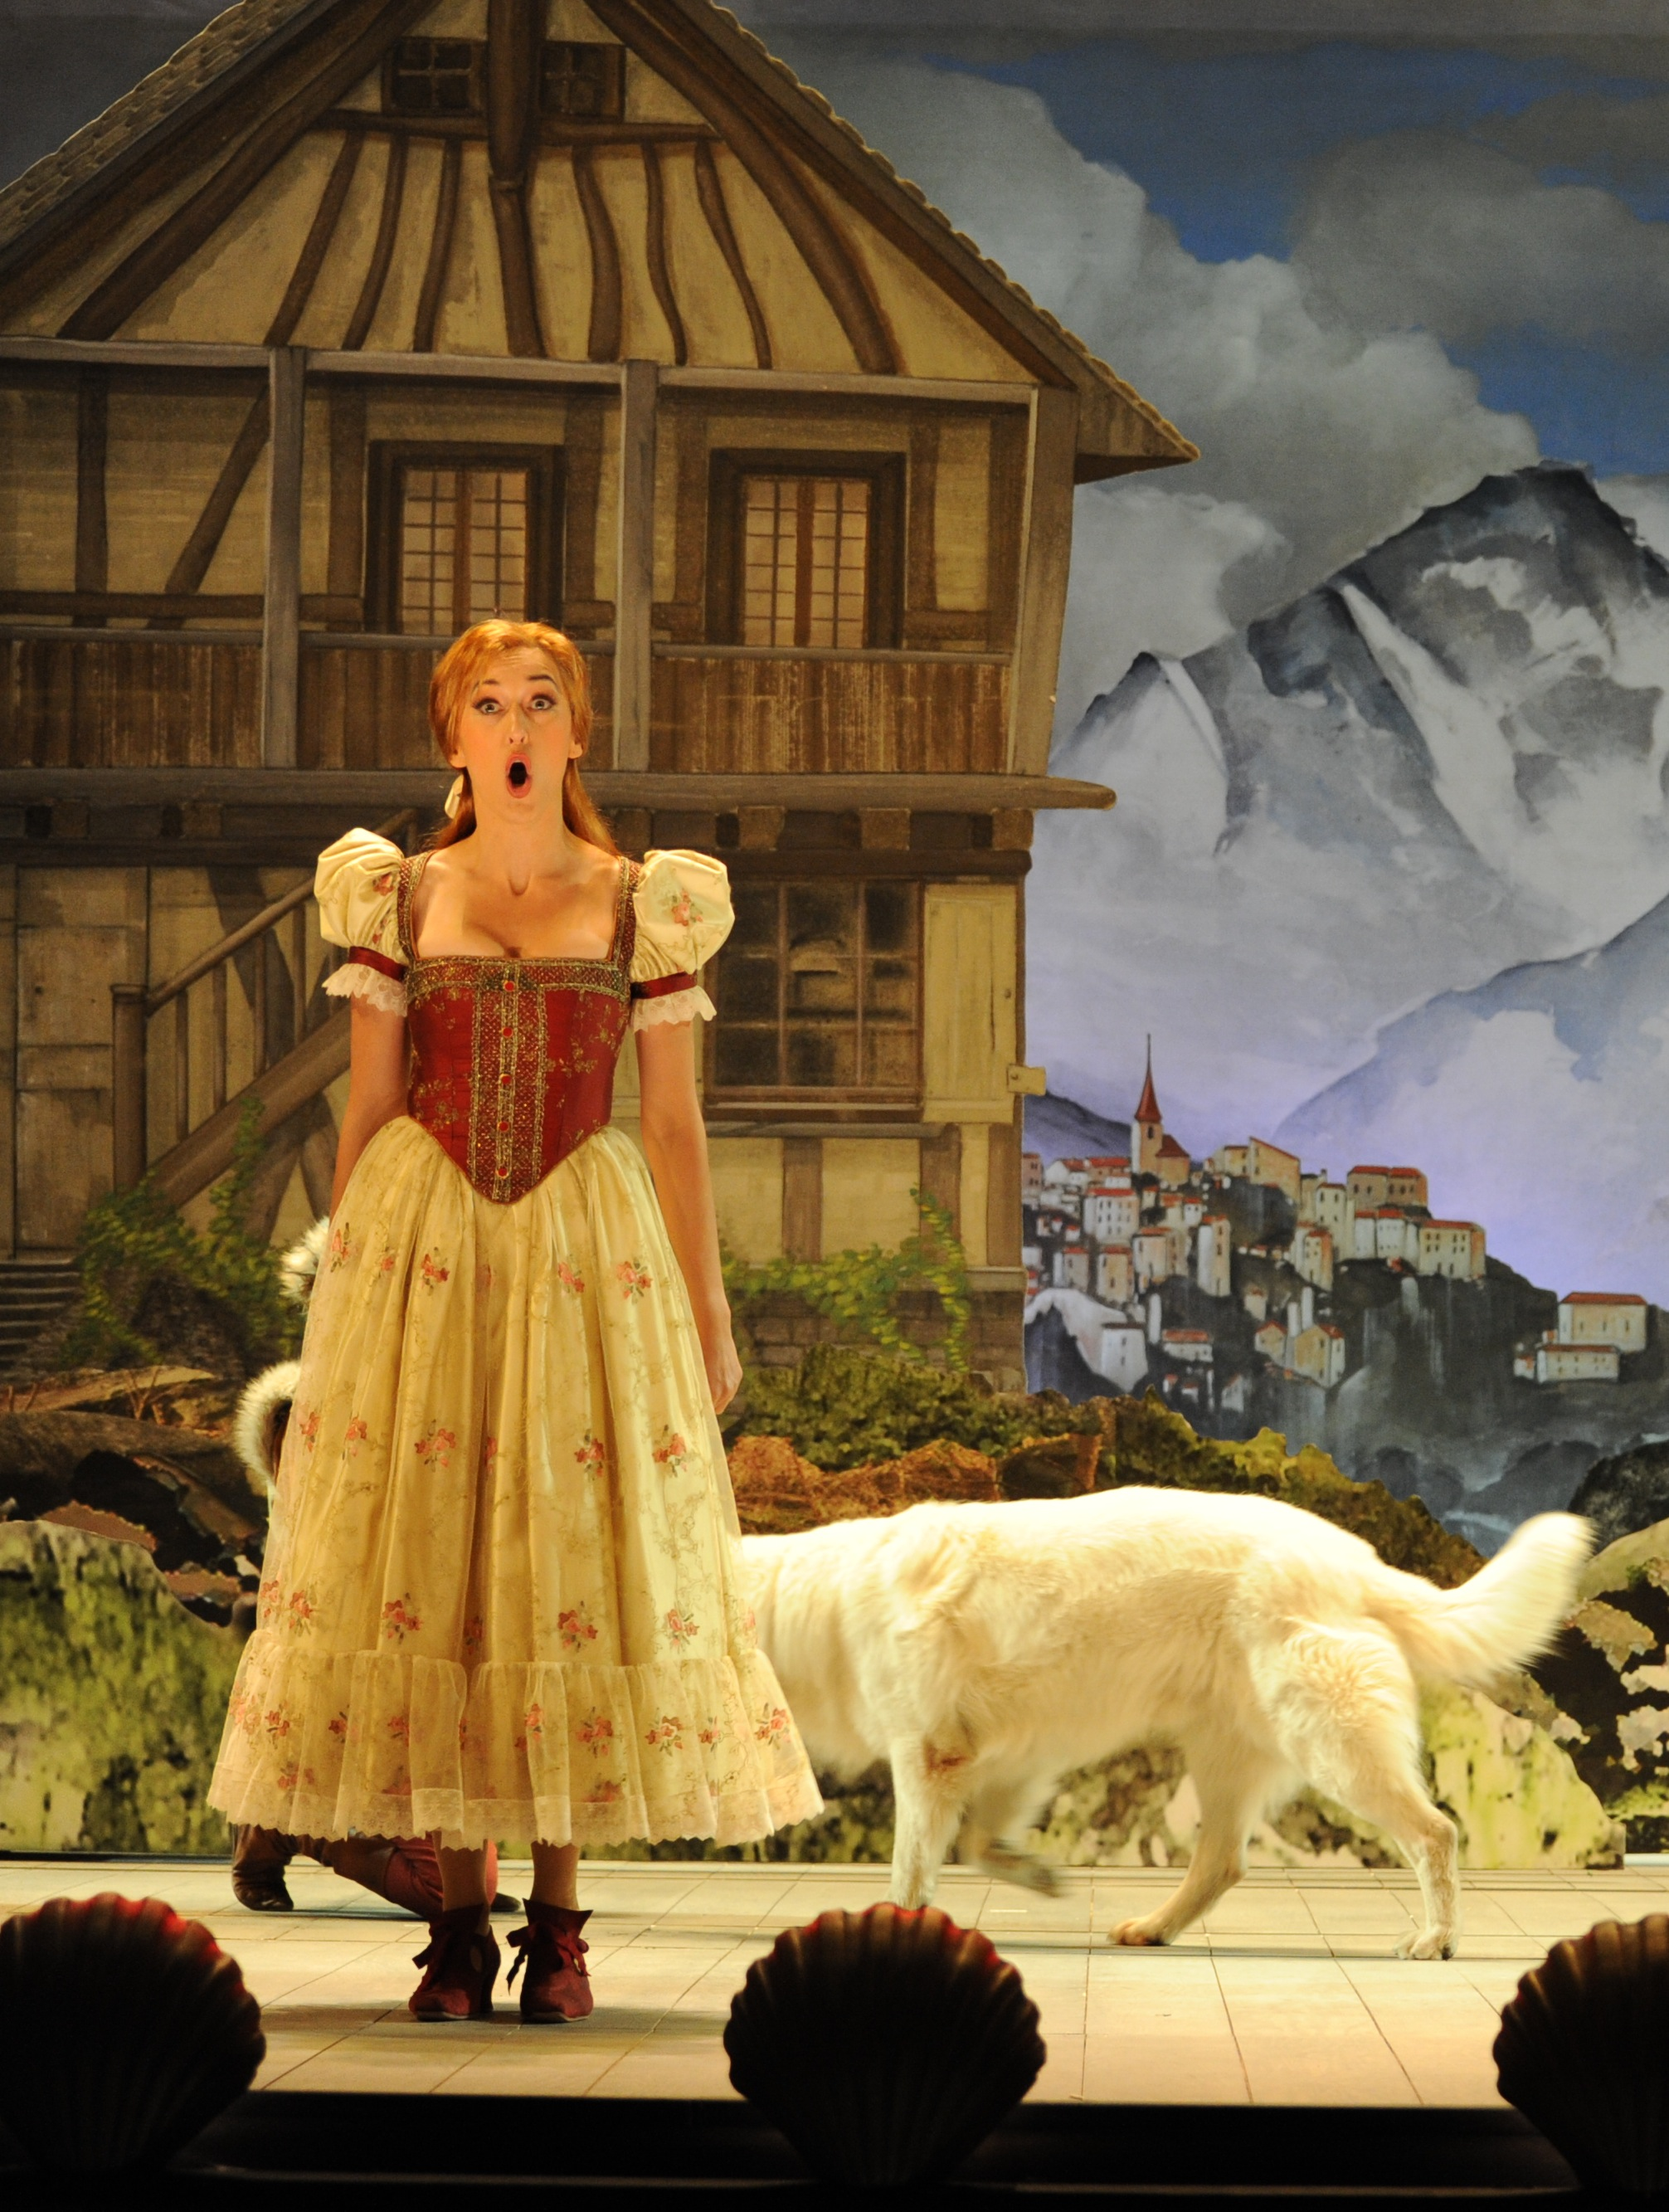 7 LDevos-Opera de Wallonie as Marie (Grétry) .JPG